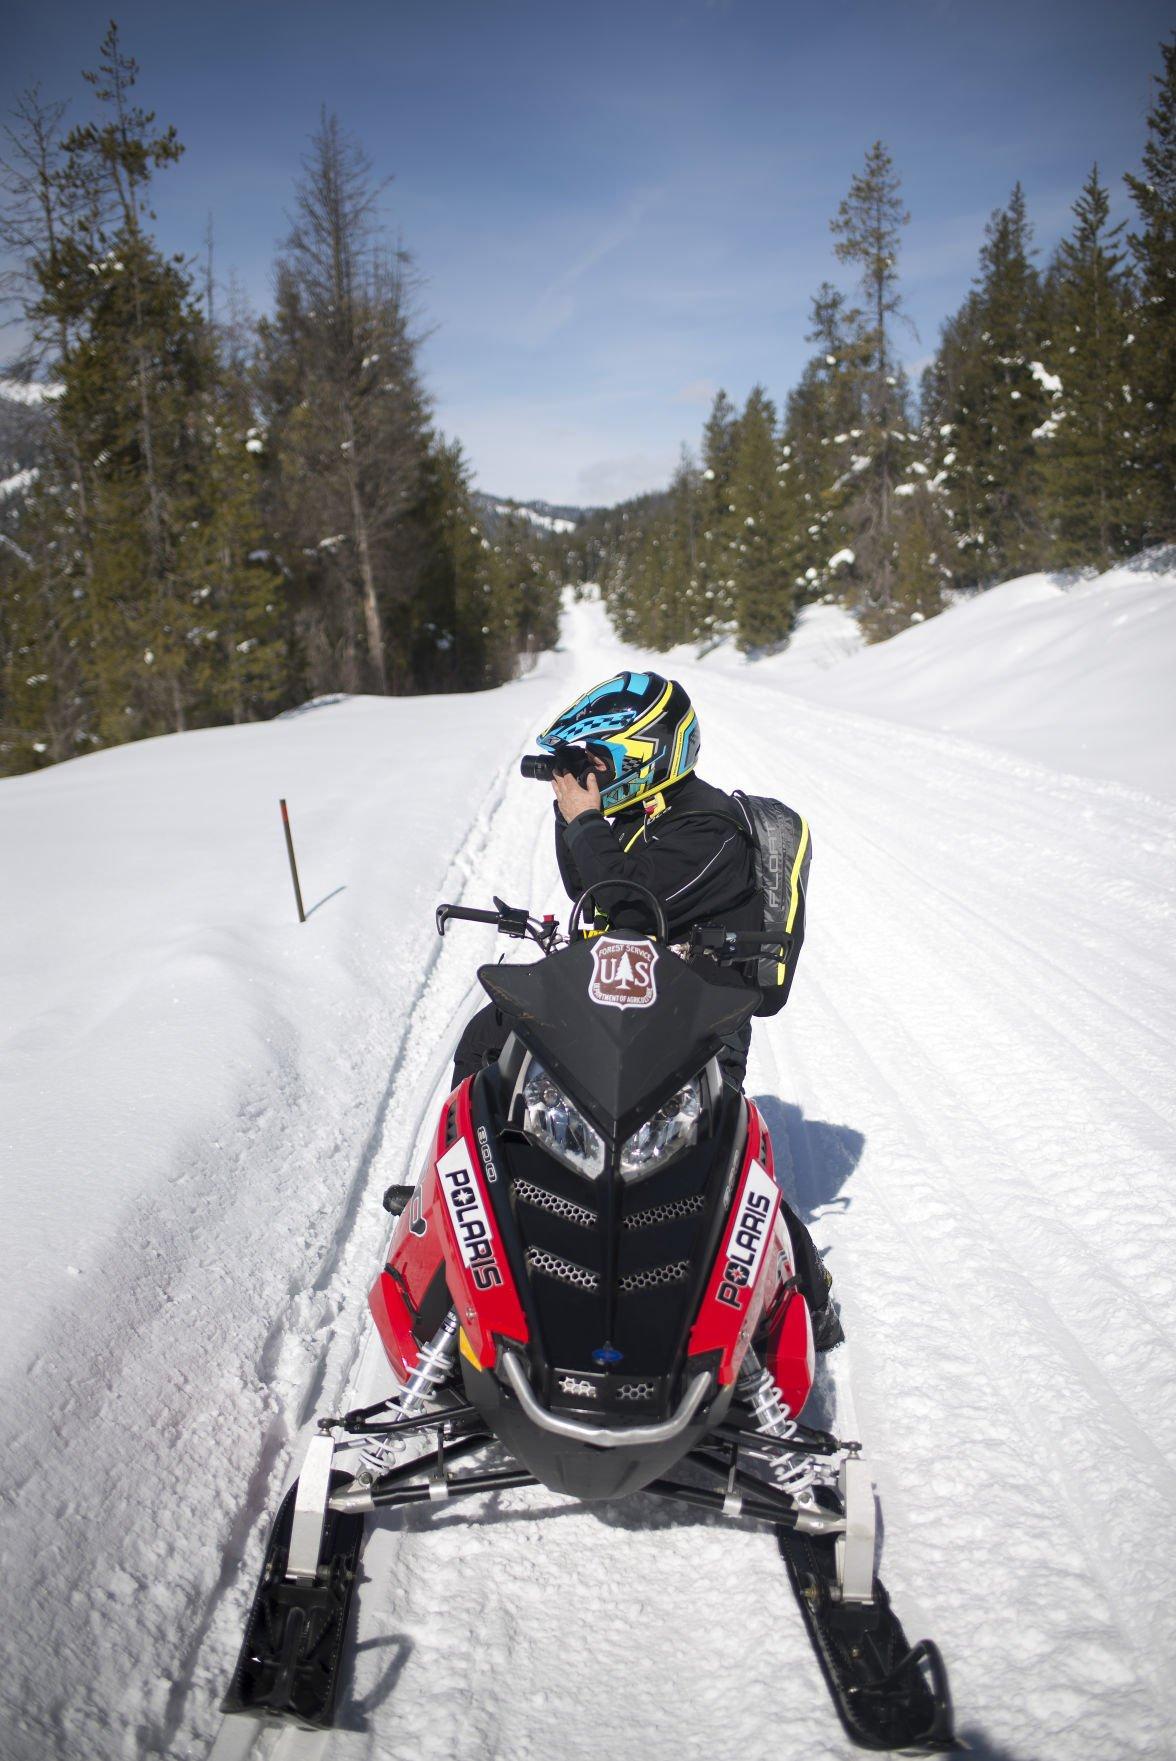 Bridger-Teton avalanche lab Comey